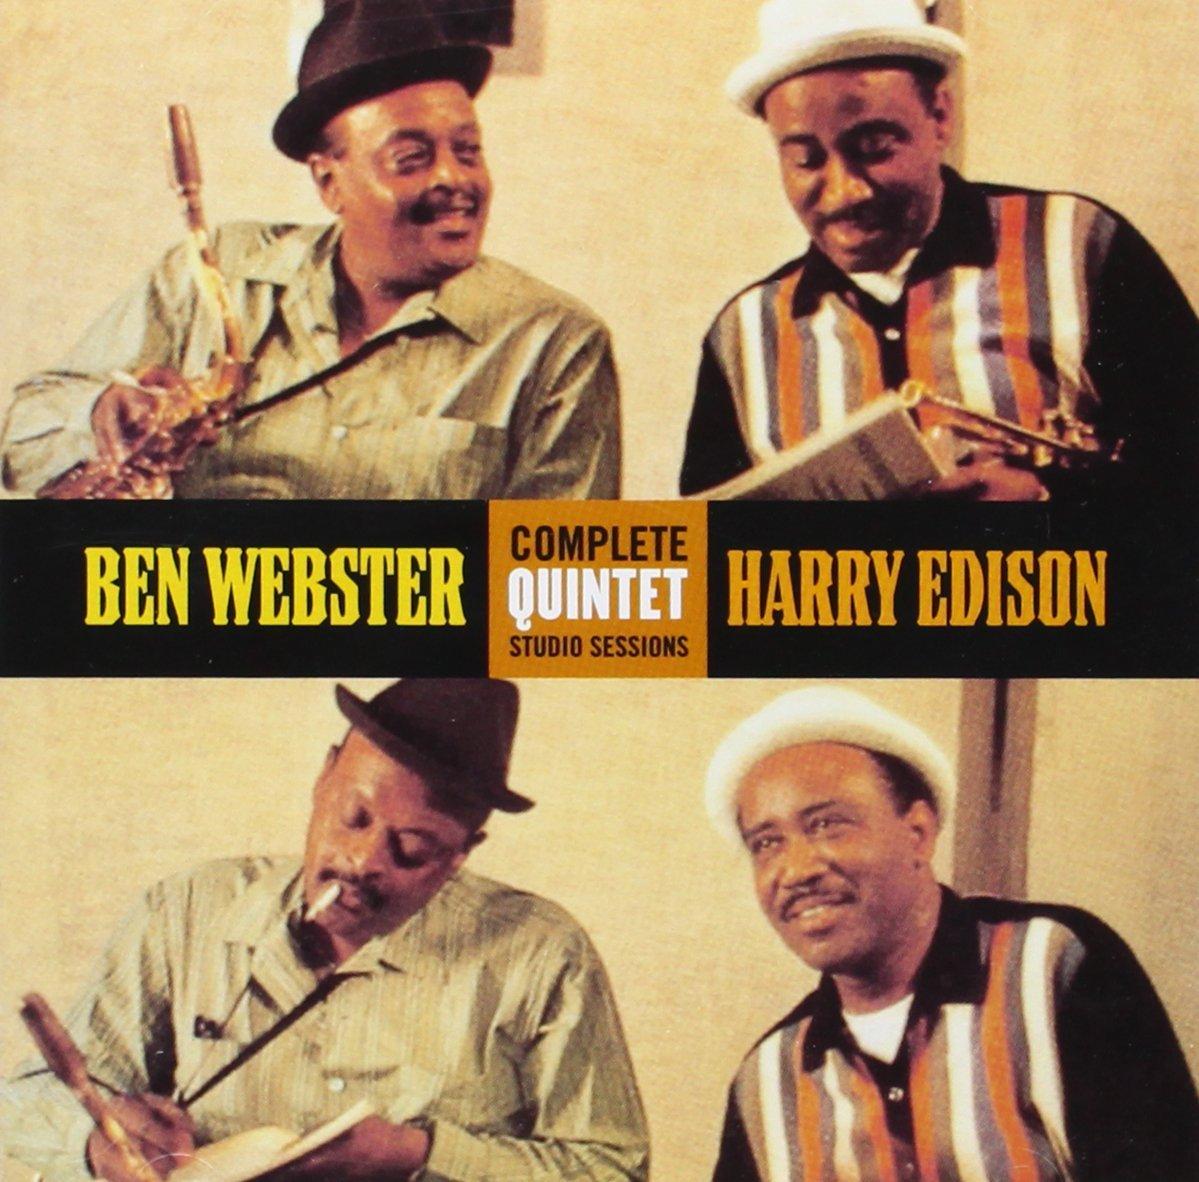 BEN WEBSTER - HARRY EDISON COMPLETE QUINTET STUDIO SESSIONS (C